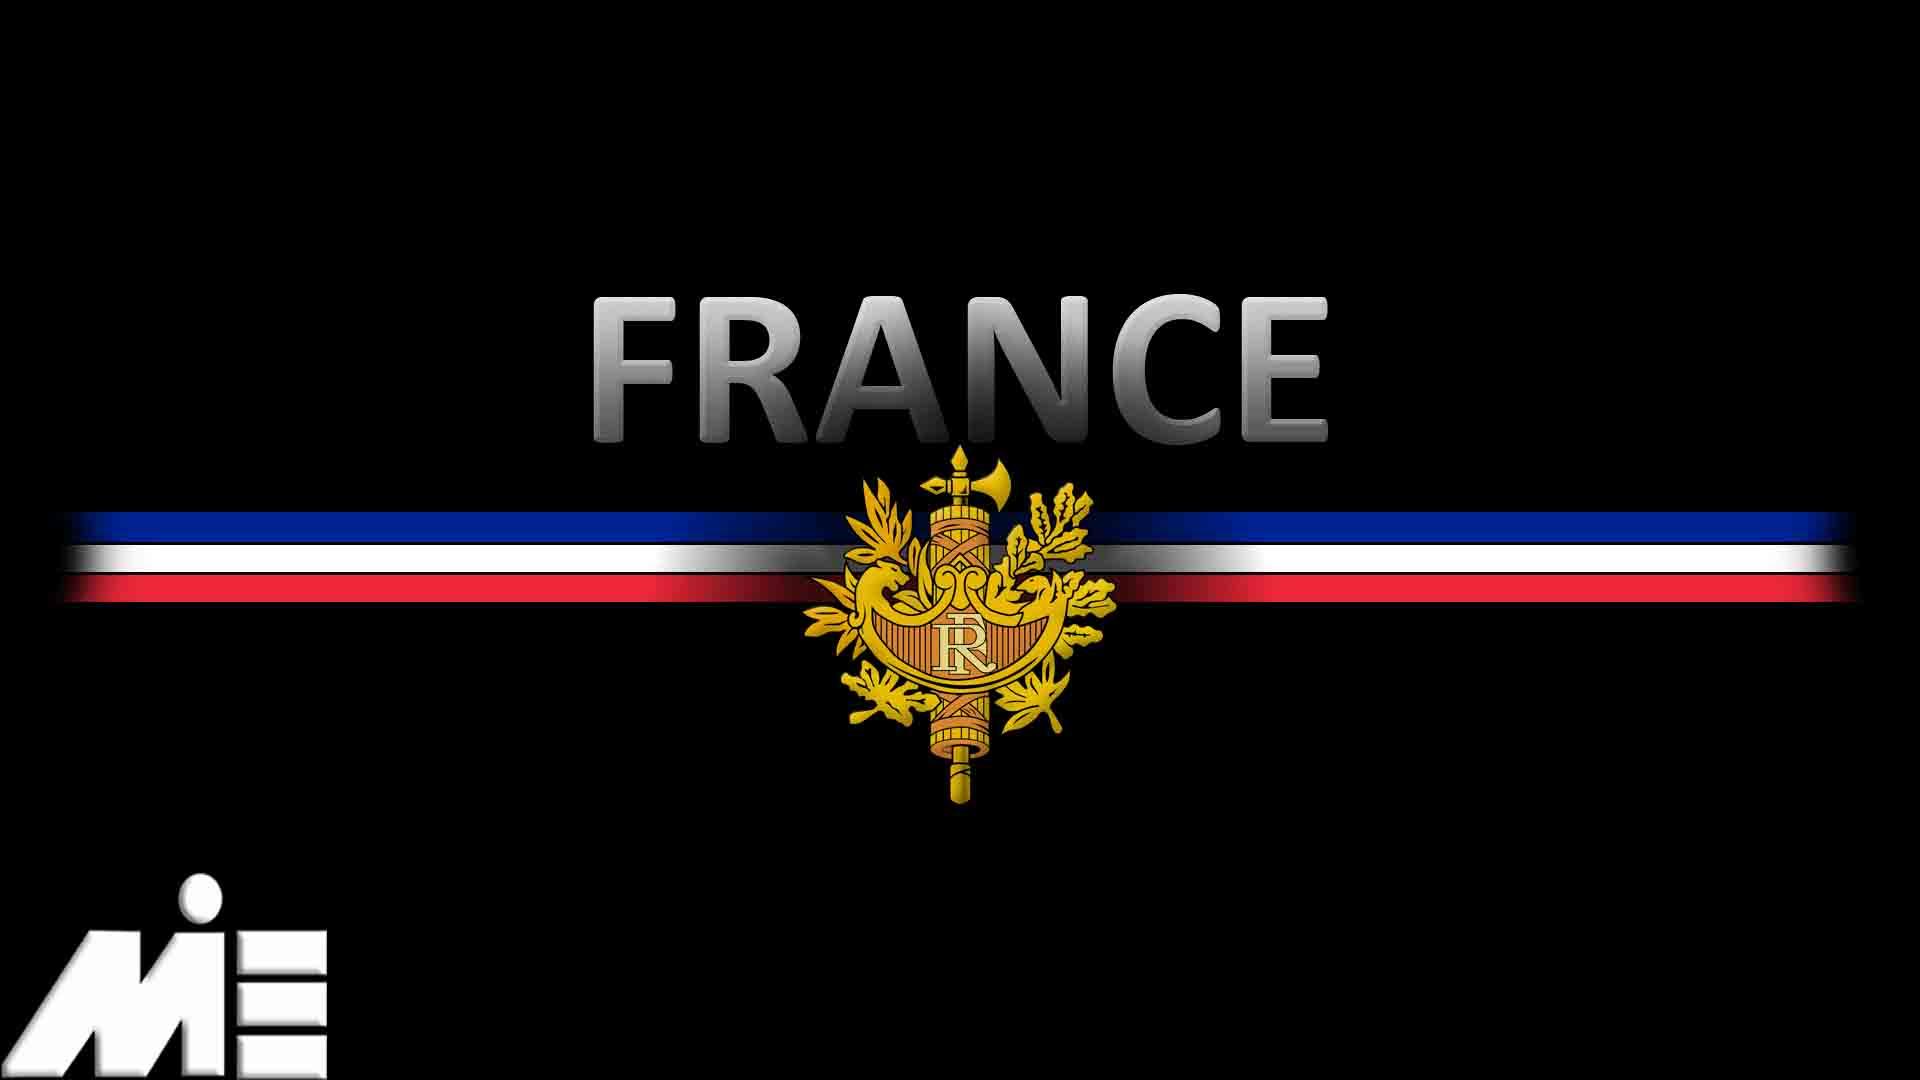 فرانسه - مهاجرت به فرانسه - france